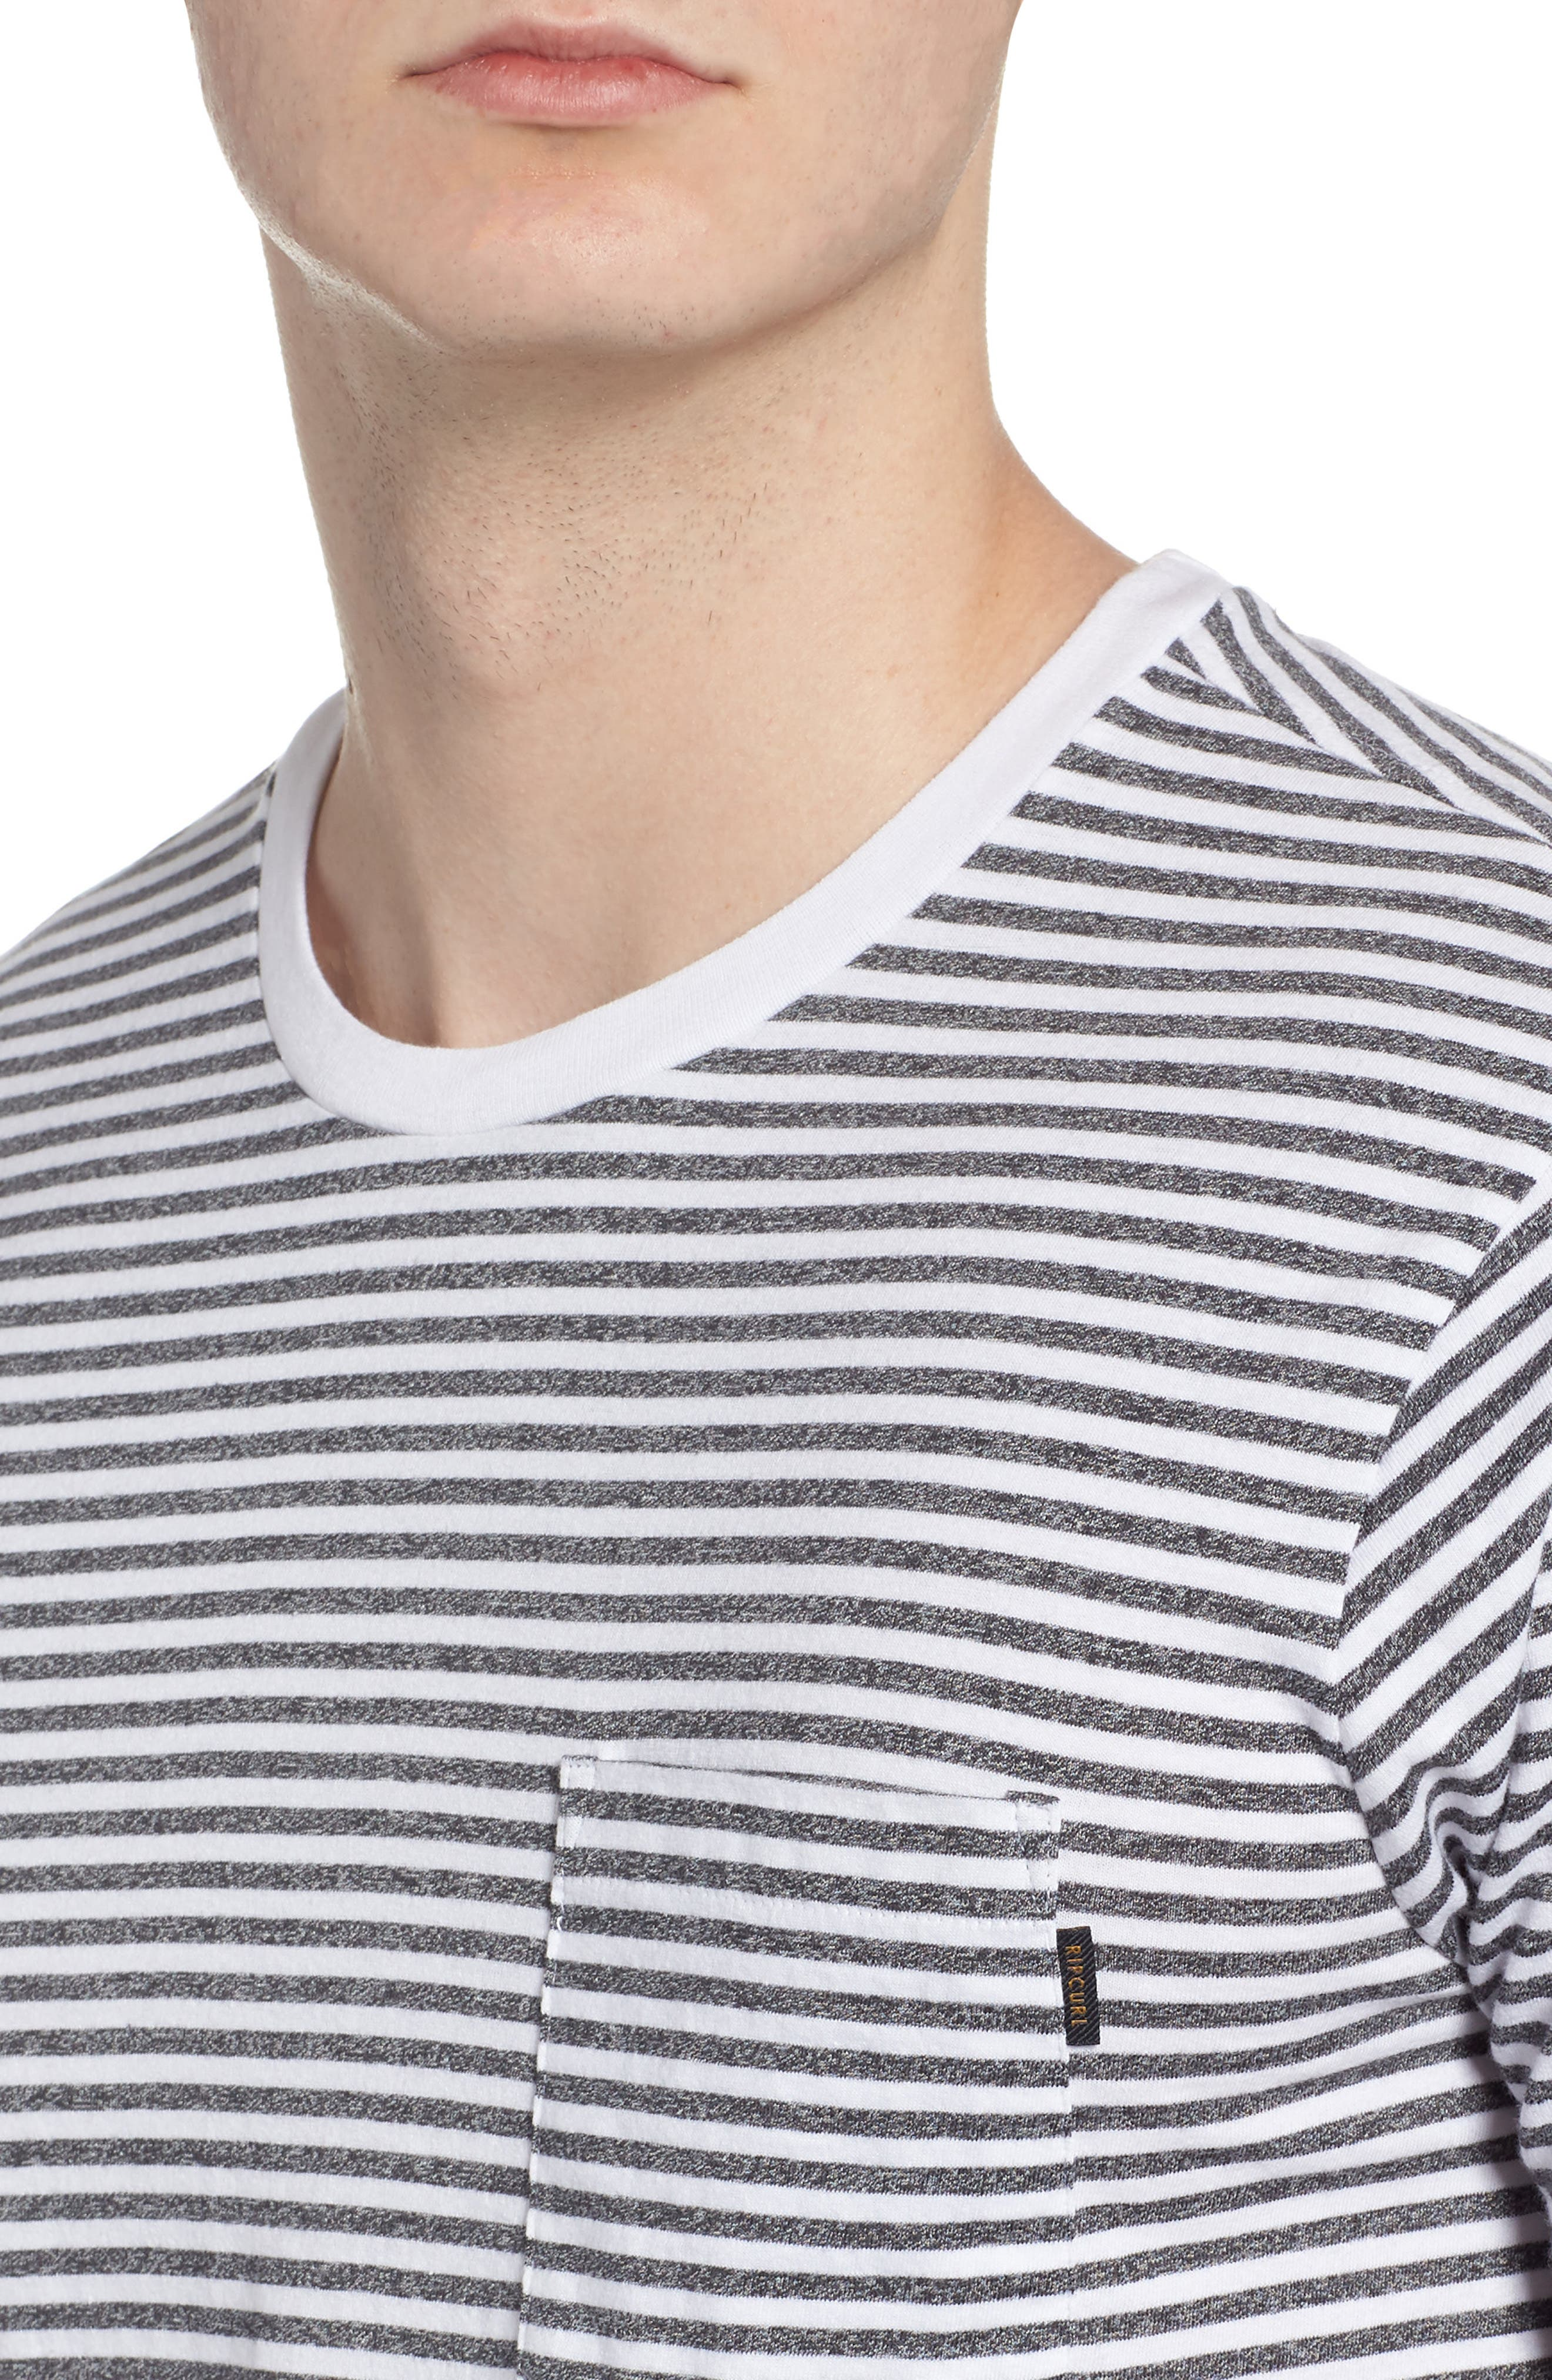 Prospect T-Shirt,                             Alternate thumbnail 12, color,